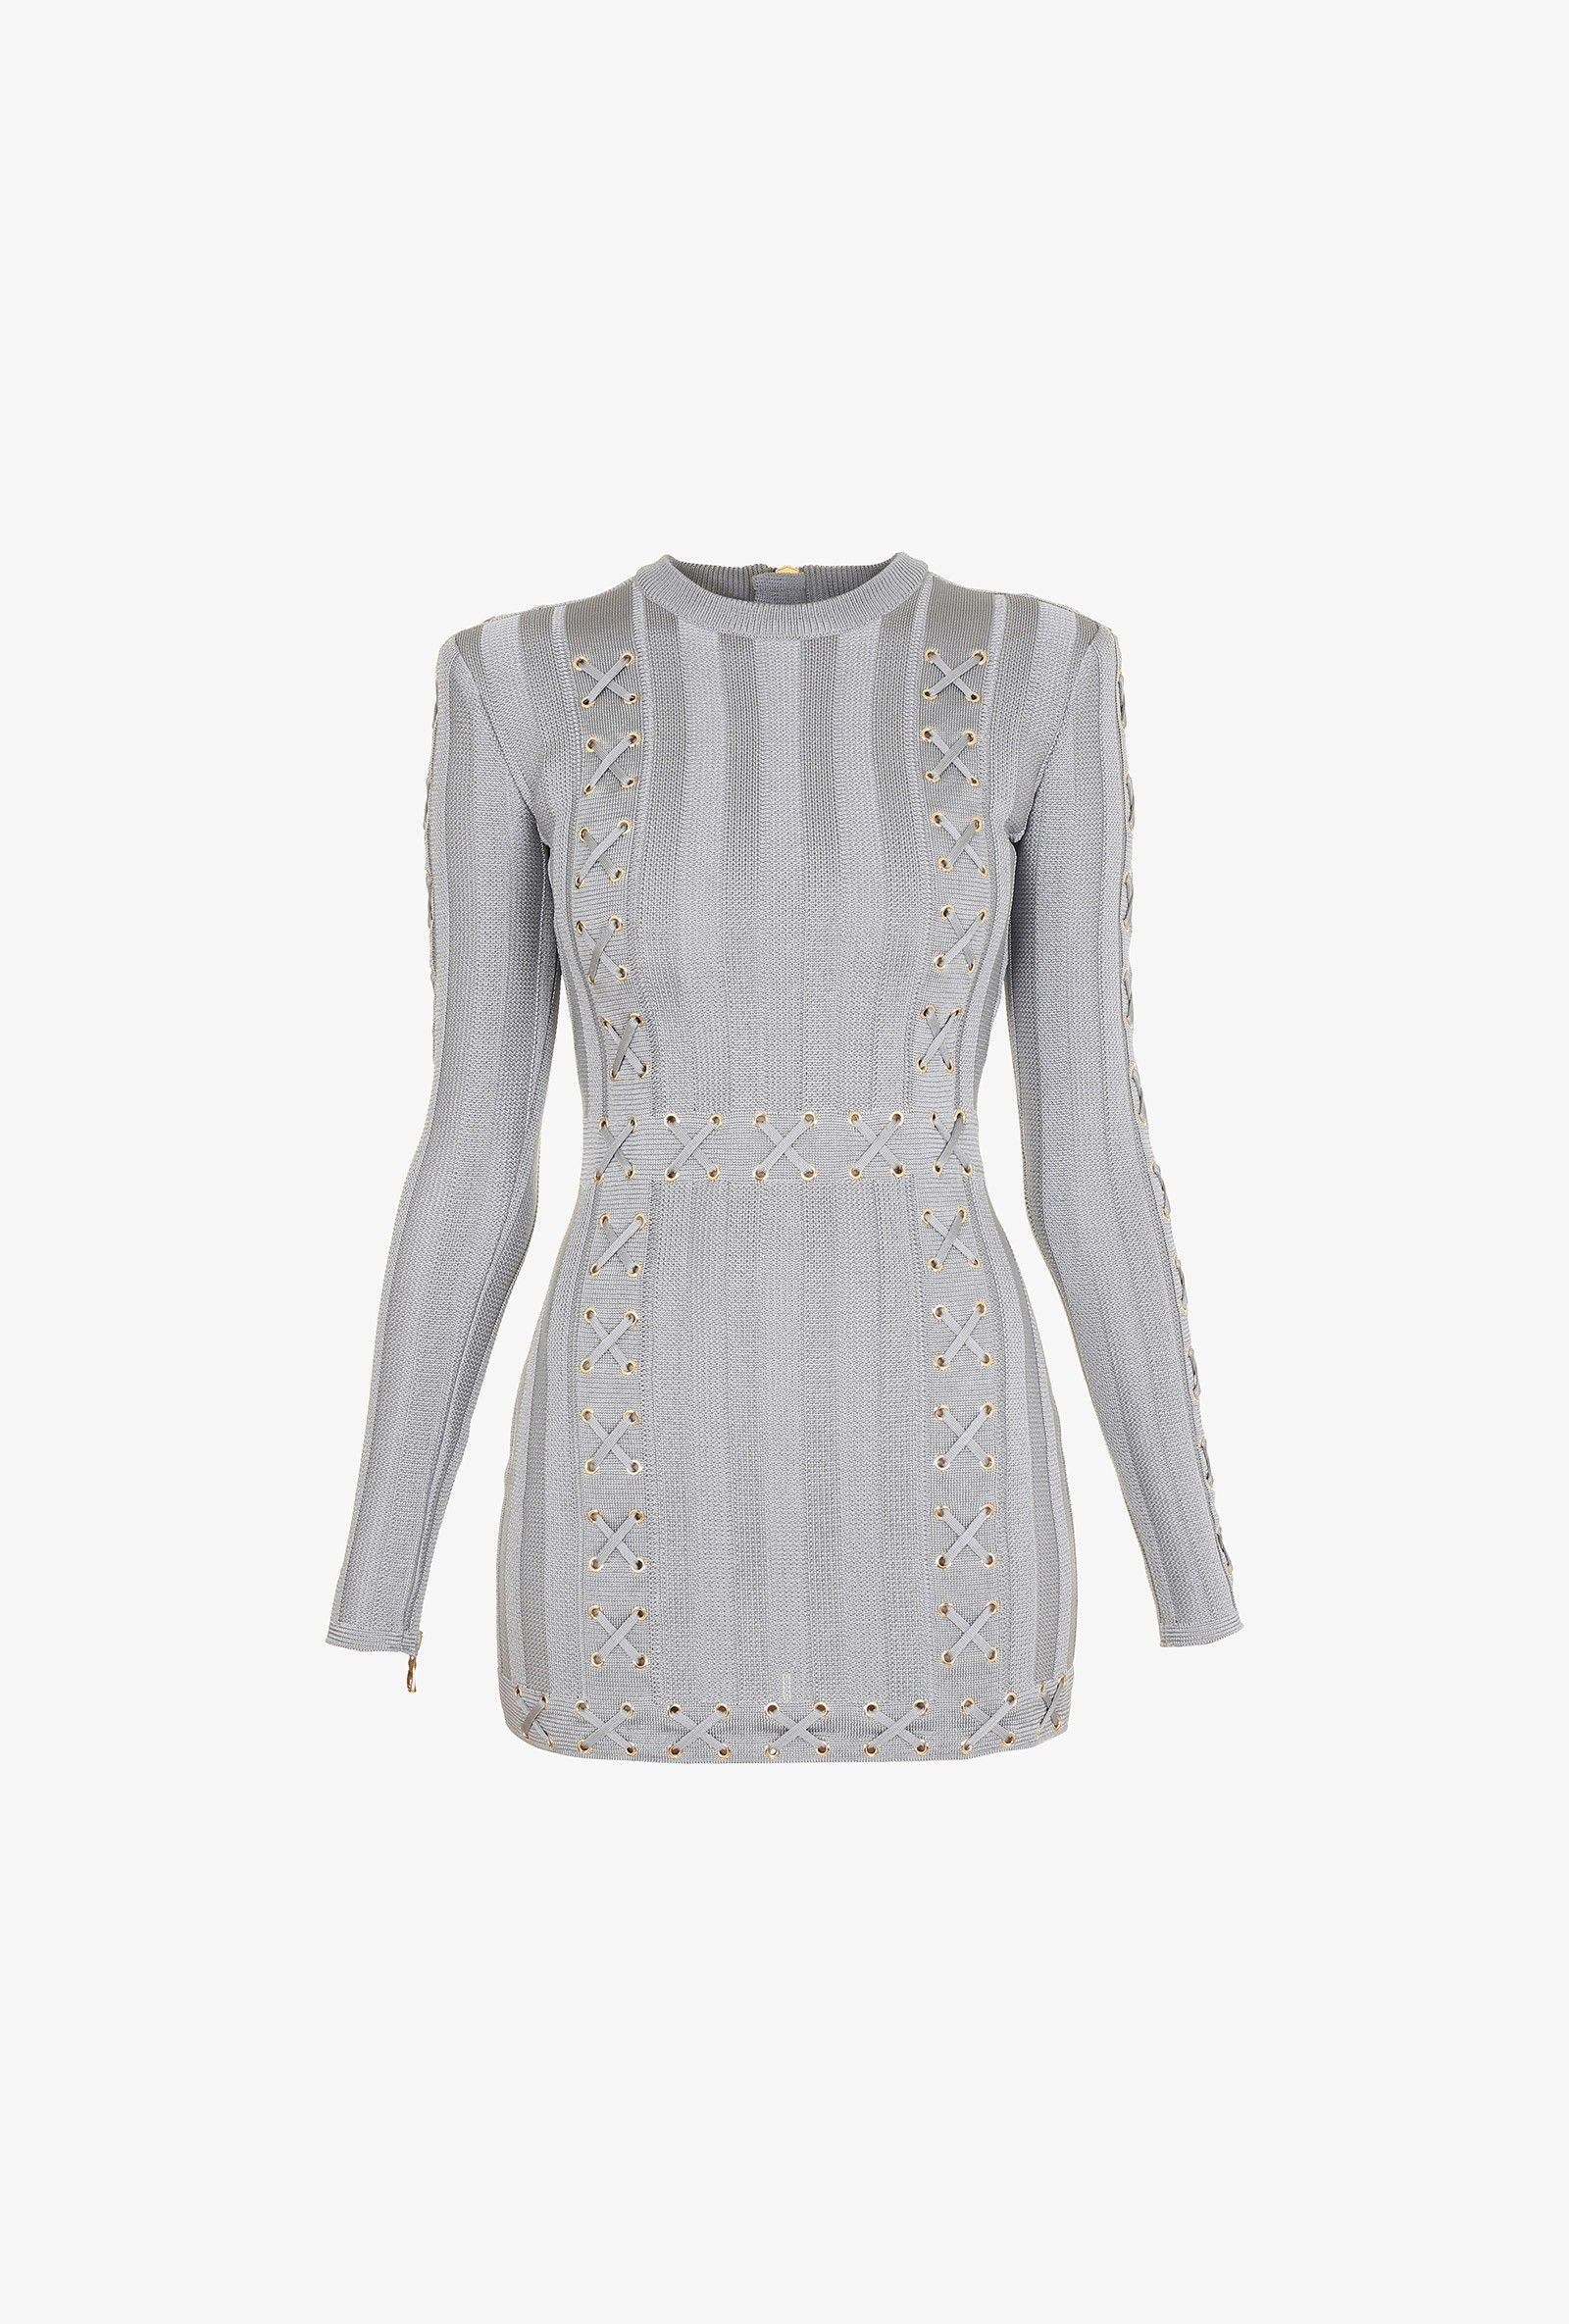 120d7695aee6 Balmain - Grey lace-up knit mini dress